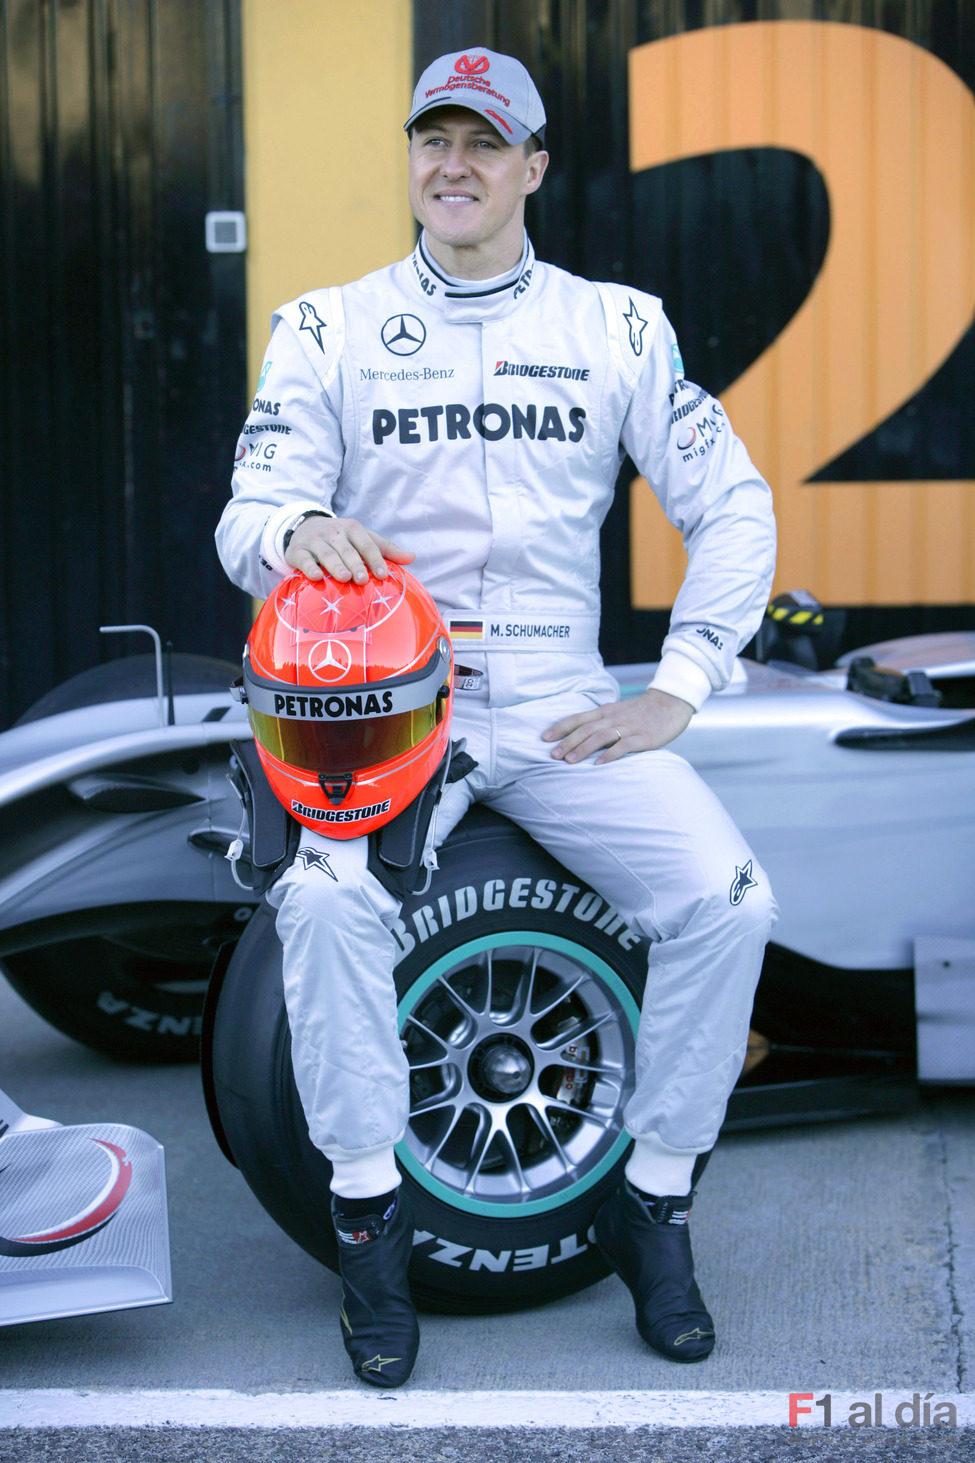 Michael Schumacher confiado